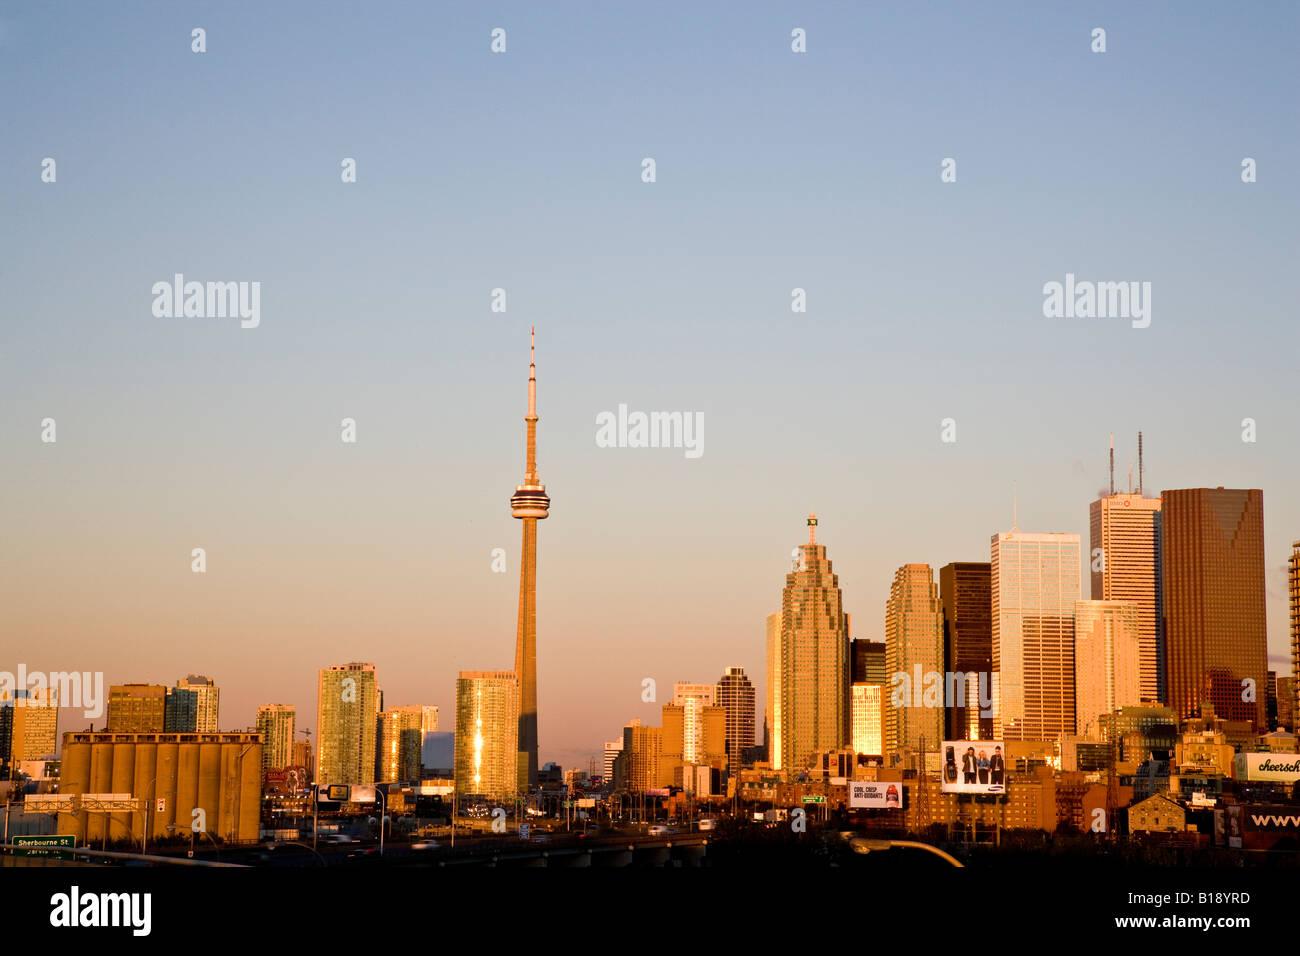 Ville de Toronto au matin vu de l'Est, Toronto, Ontario, Canada. Banque D'Images